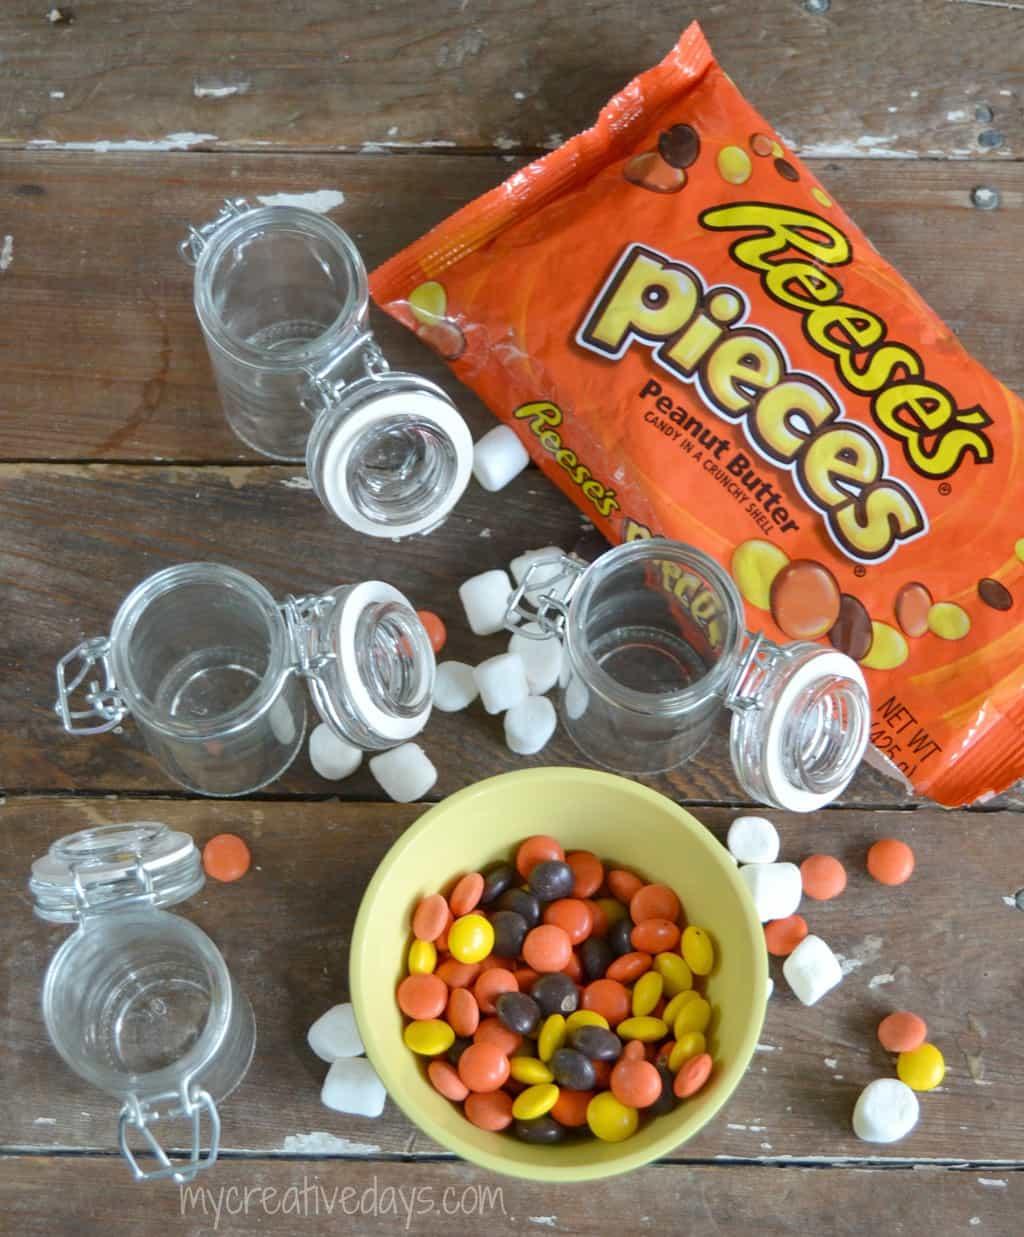 'Candy Corn' Gifts mycreativedays.com